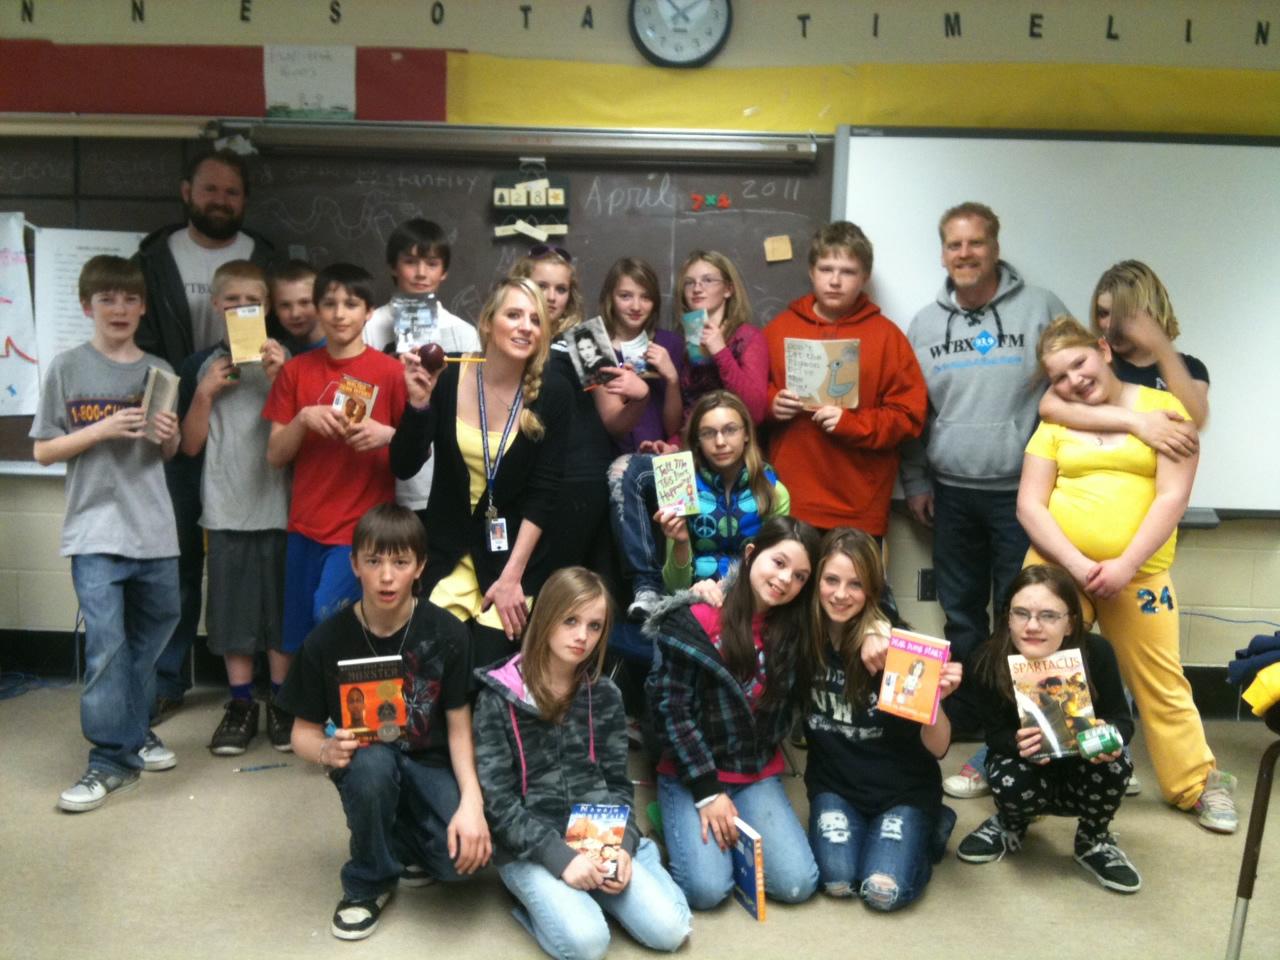 Photo 2 of 4 | Ms. Kallerman\'s 6th Grade Class in Bigfork | 93.9 WTBX